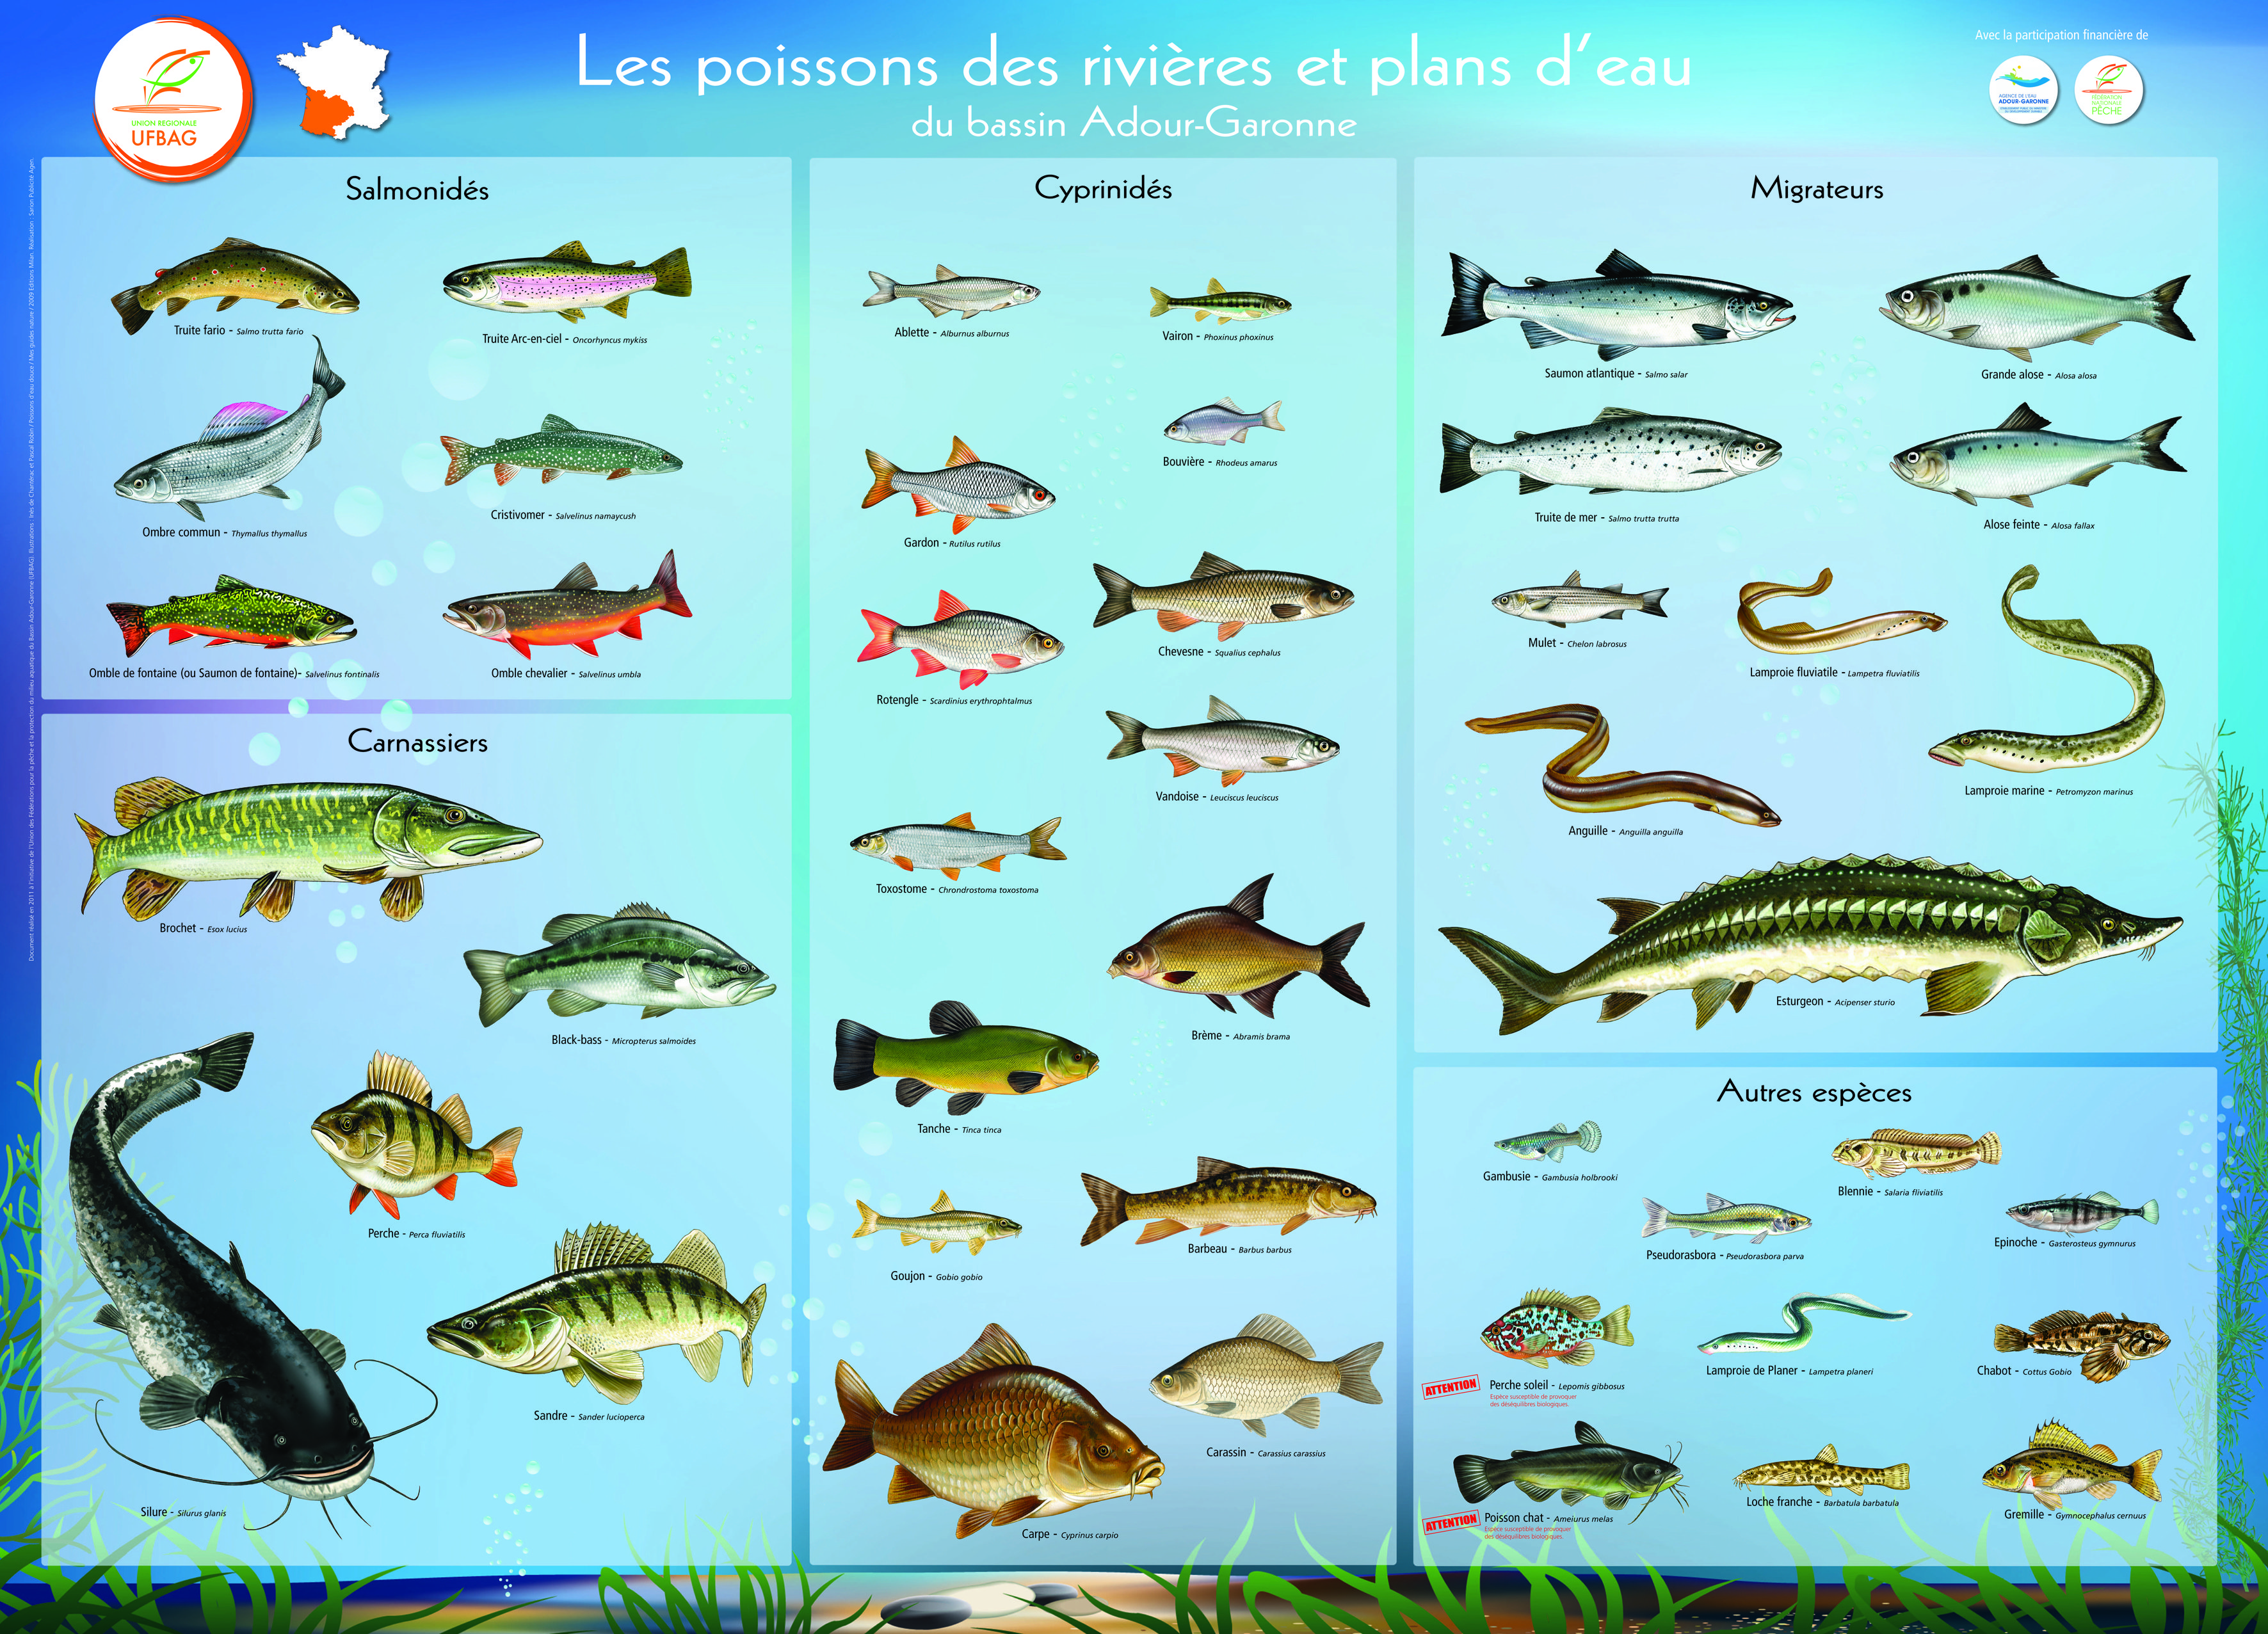 Poissons dans Dessins naturalistes UFBAG-Poster-4-ok